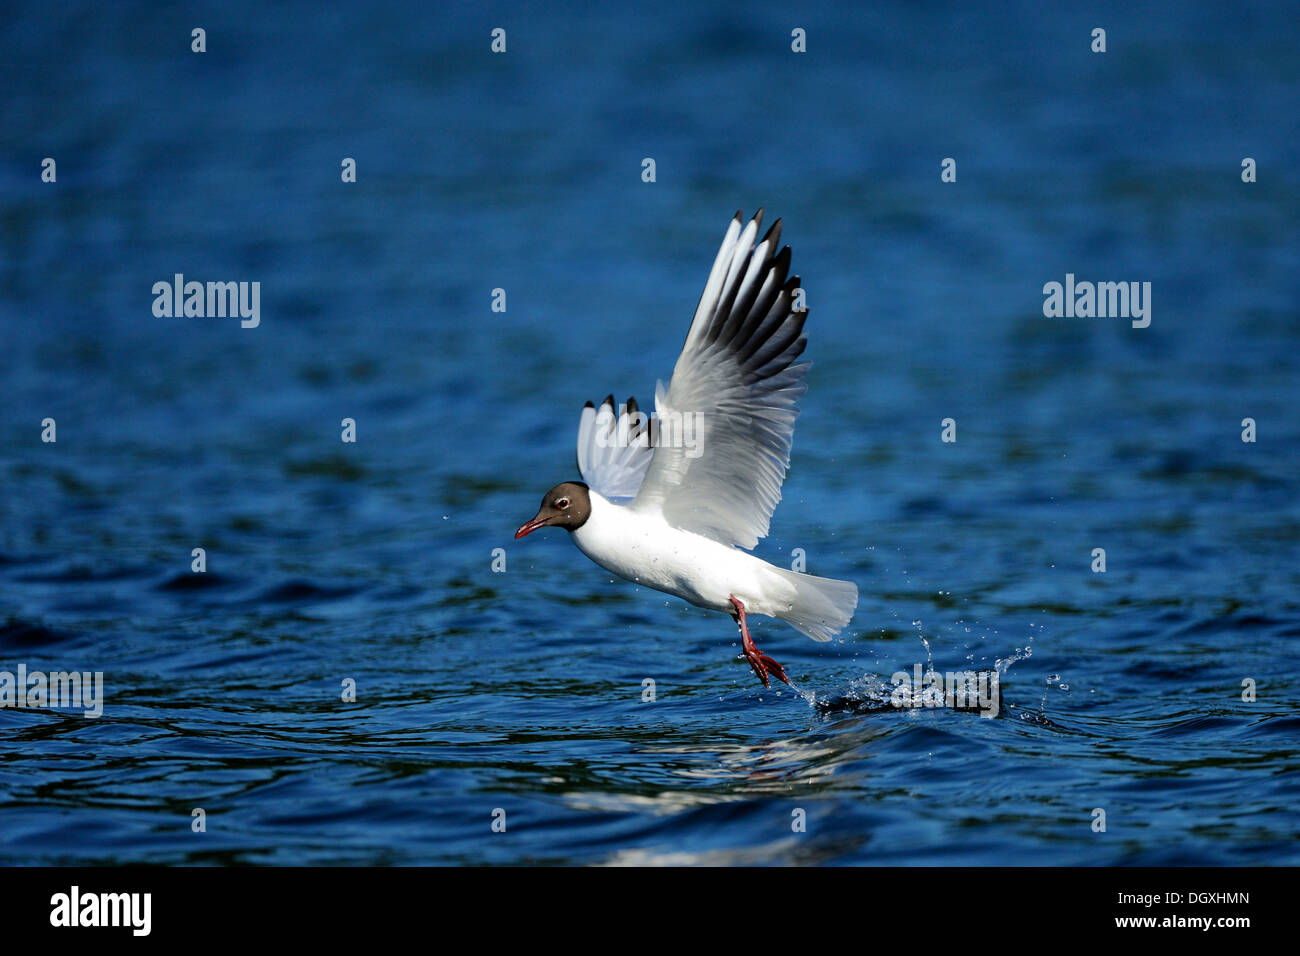 Black-headed Gull (Chroicocephalus ridibundus, Syn. Larus ridibundus), during take-off, Schmaler Luzin lake, Feldberg - Stock Image